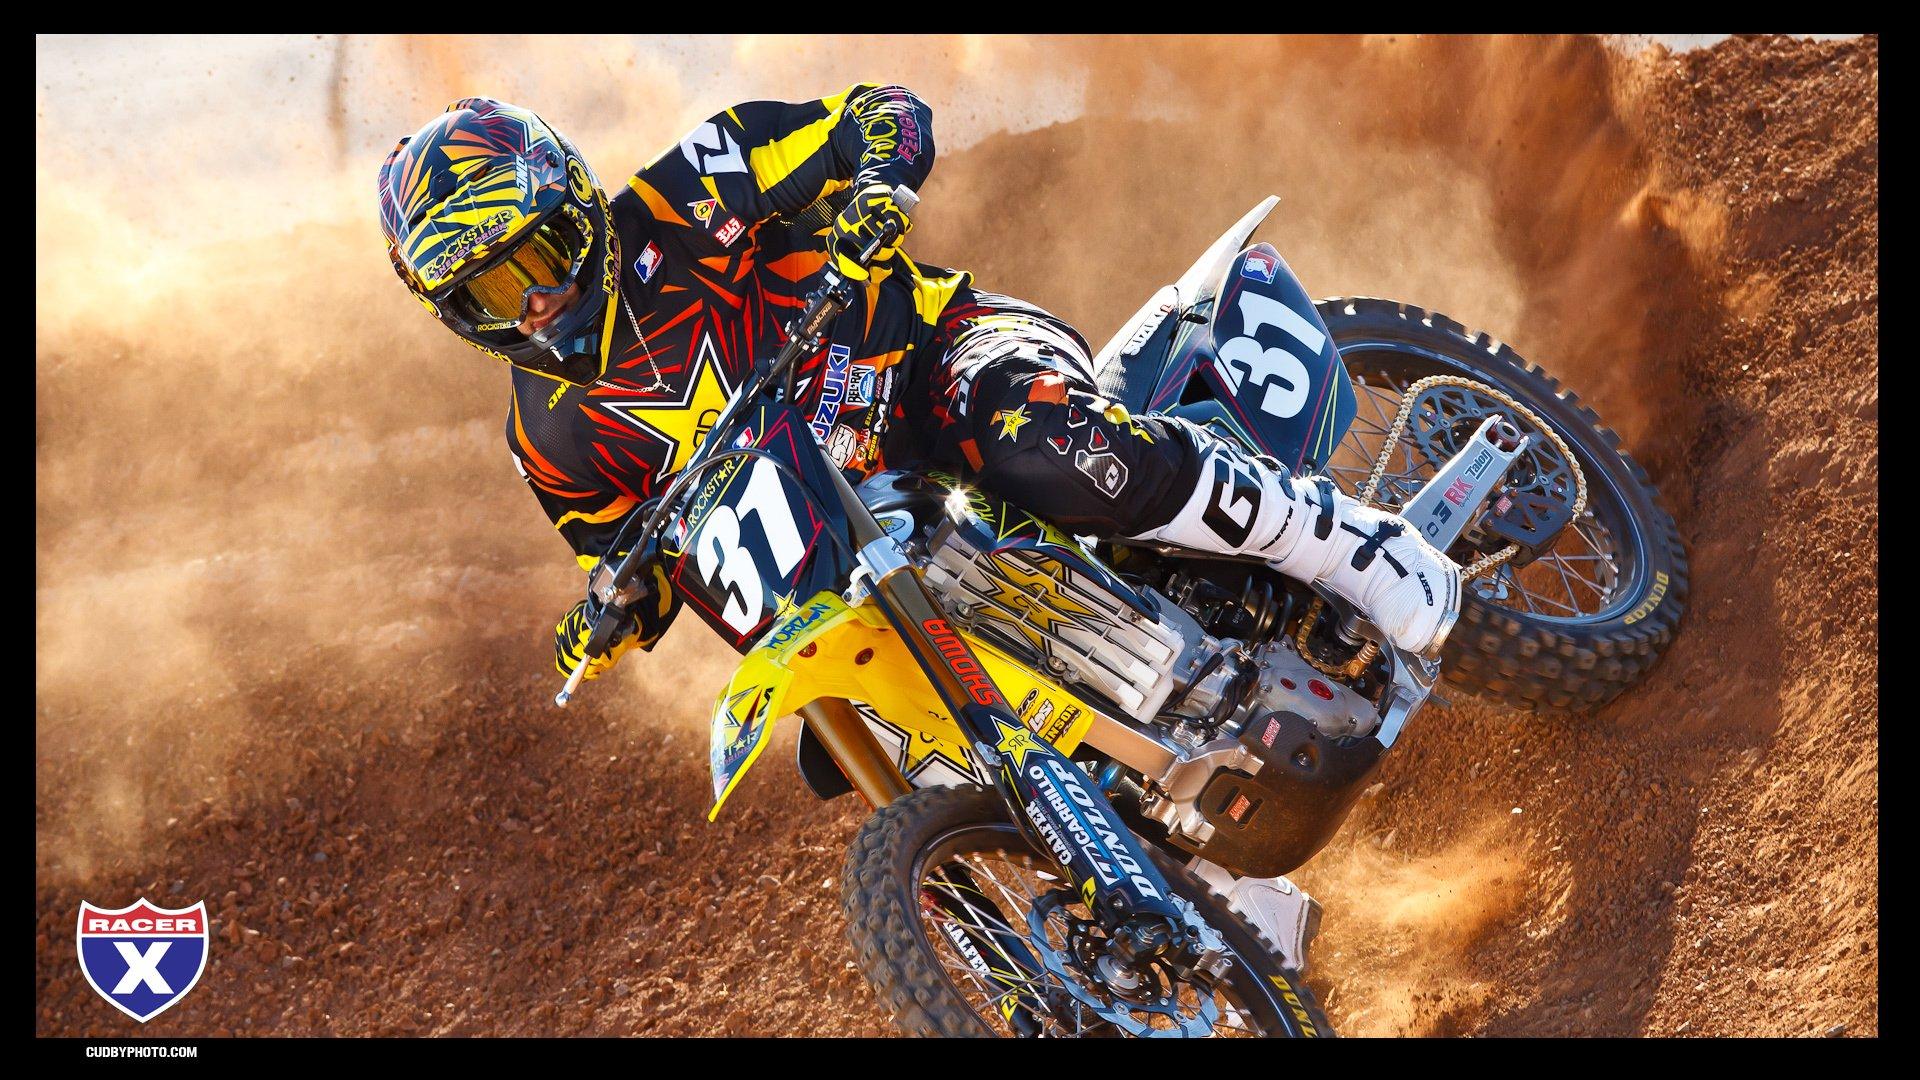 Supercross Girl Wallpaper Hd Rockstar Energy Racing Wallpapers Racer X Online